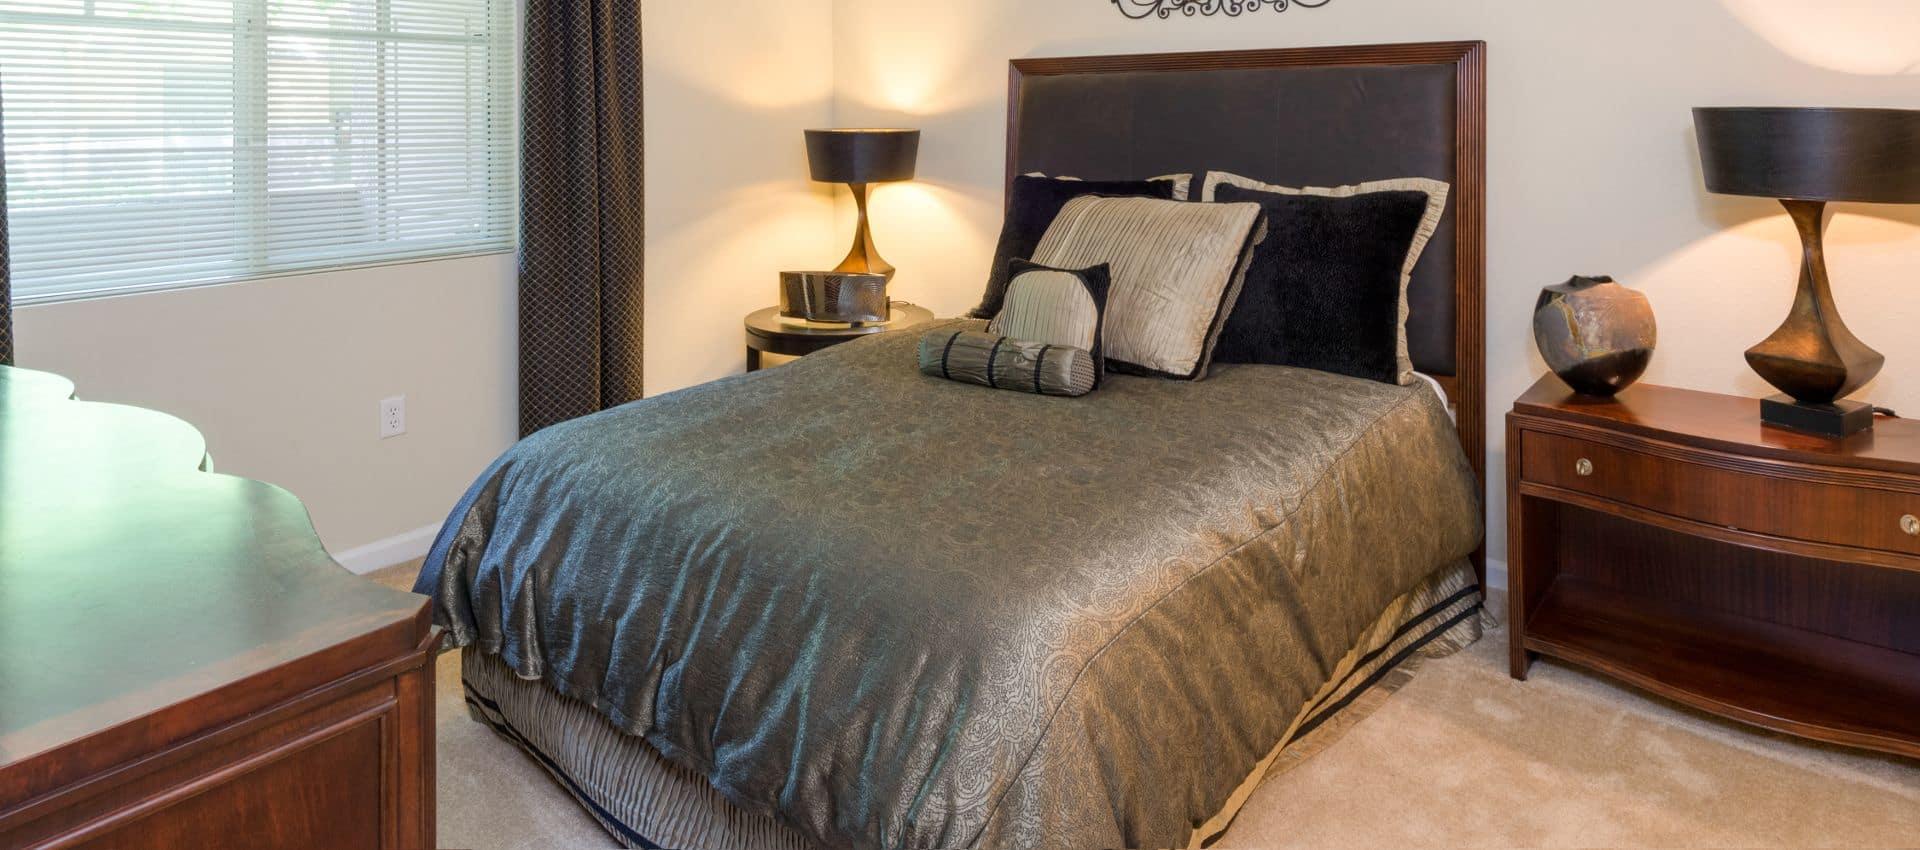 The Artisan Apartment Homes's Spacious Bedroom in Sacramento, CA